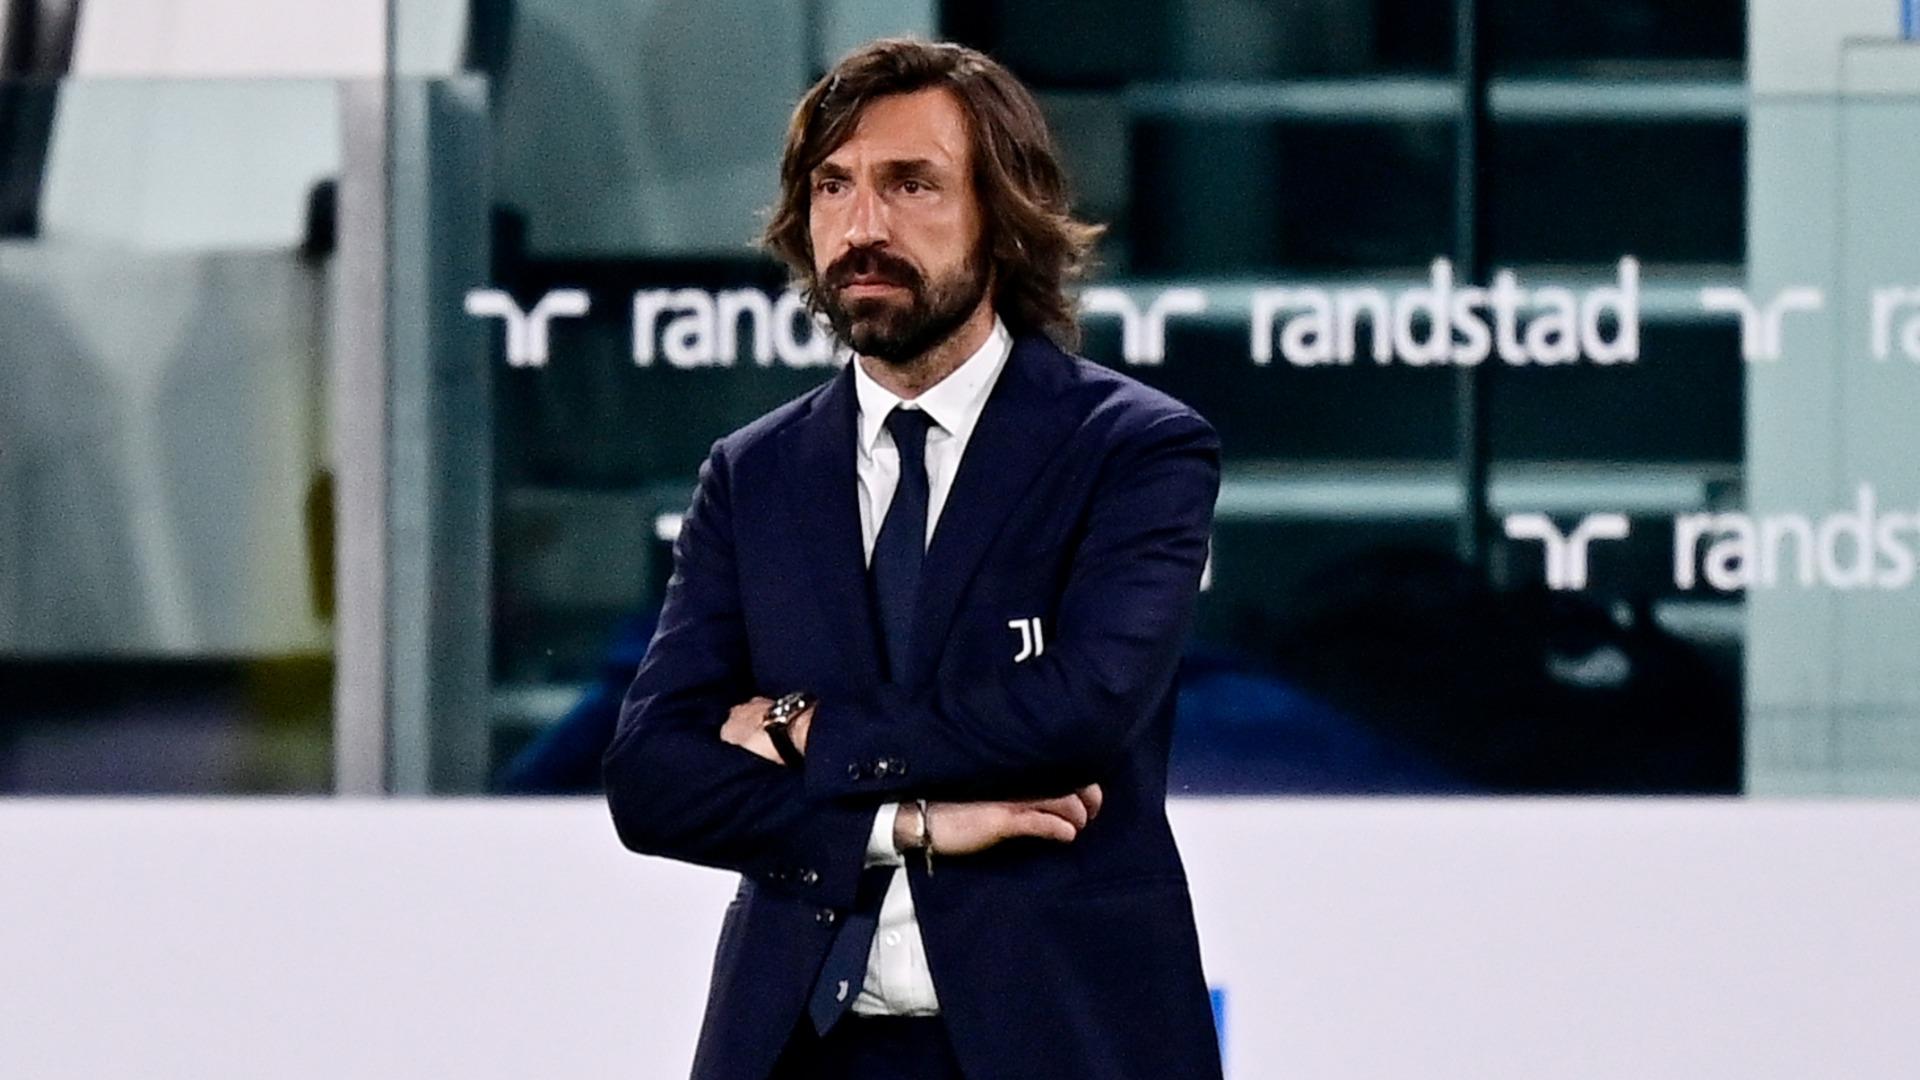 Congratulations Inter, but Juve could have done more - Pirlo laments lost Scudetto